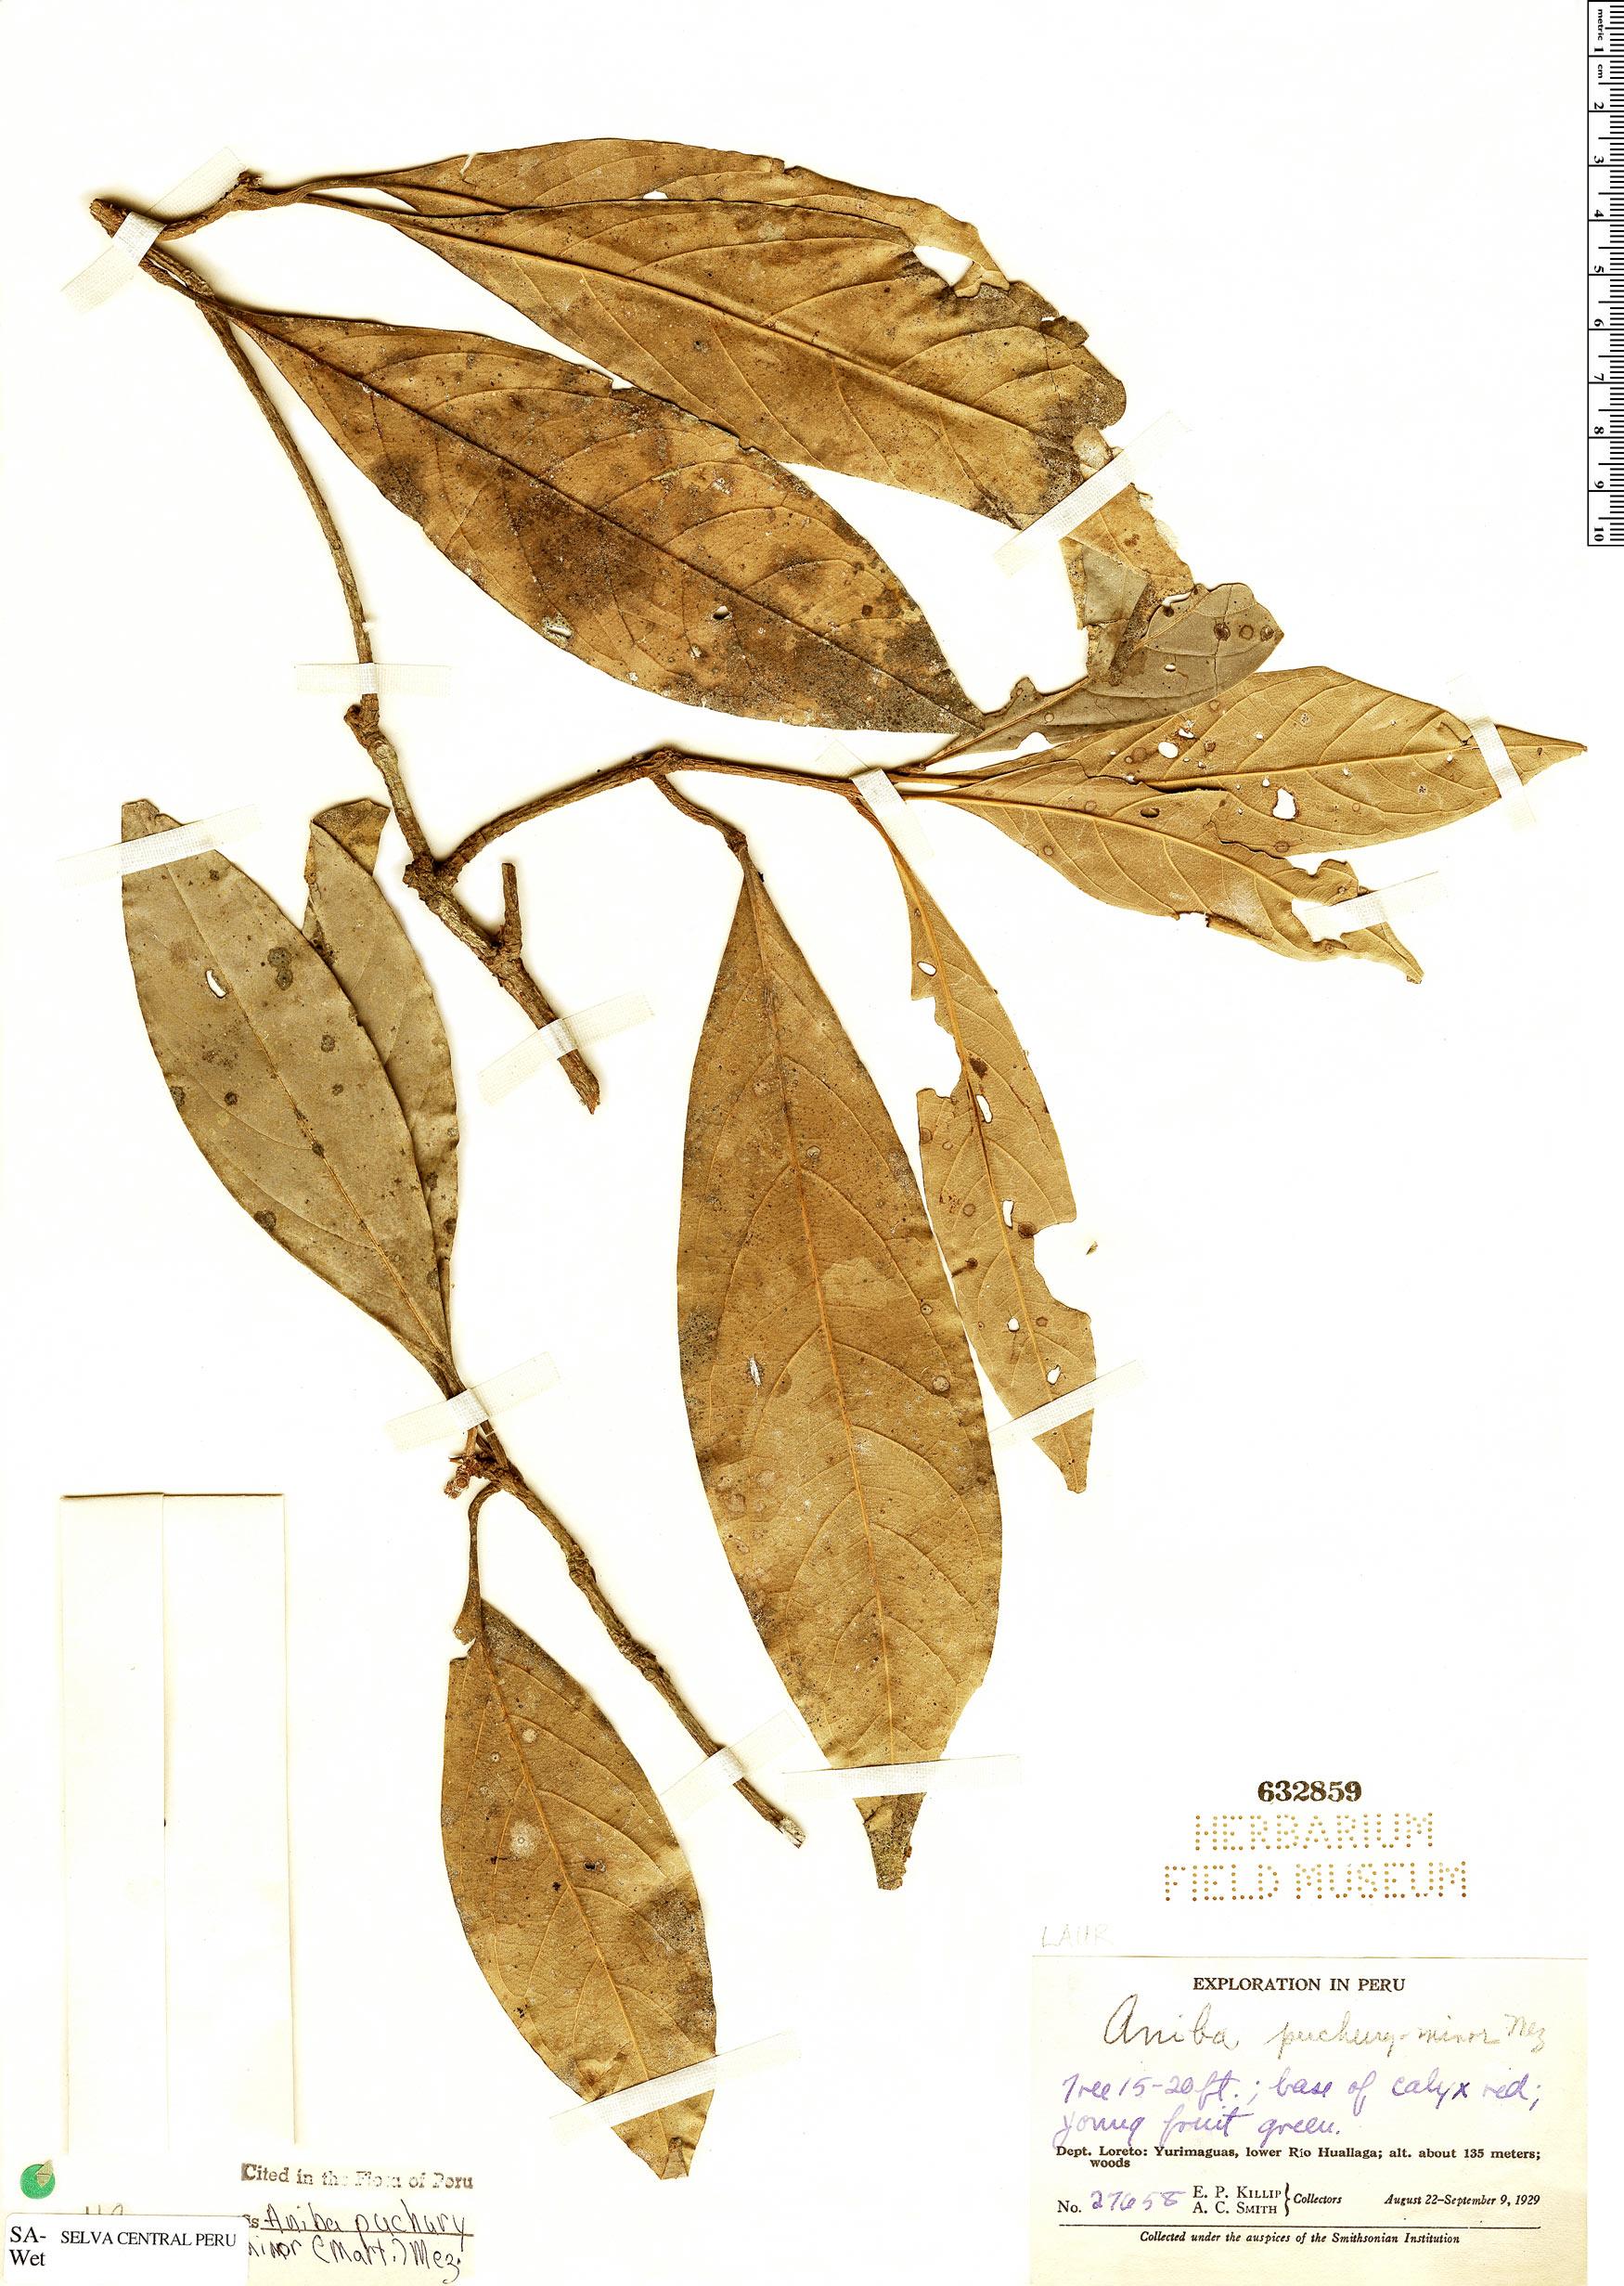 Specimen: Aniba puchury-minor